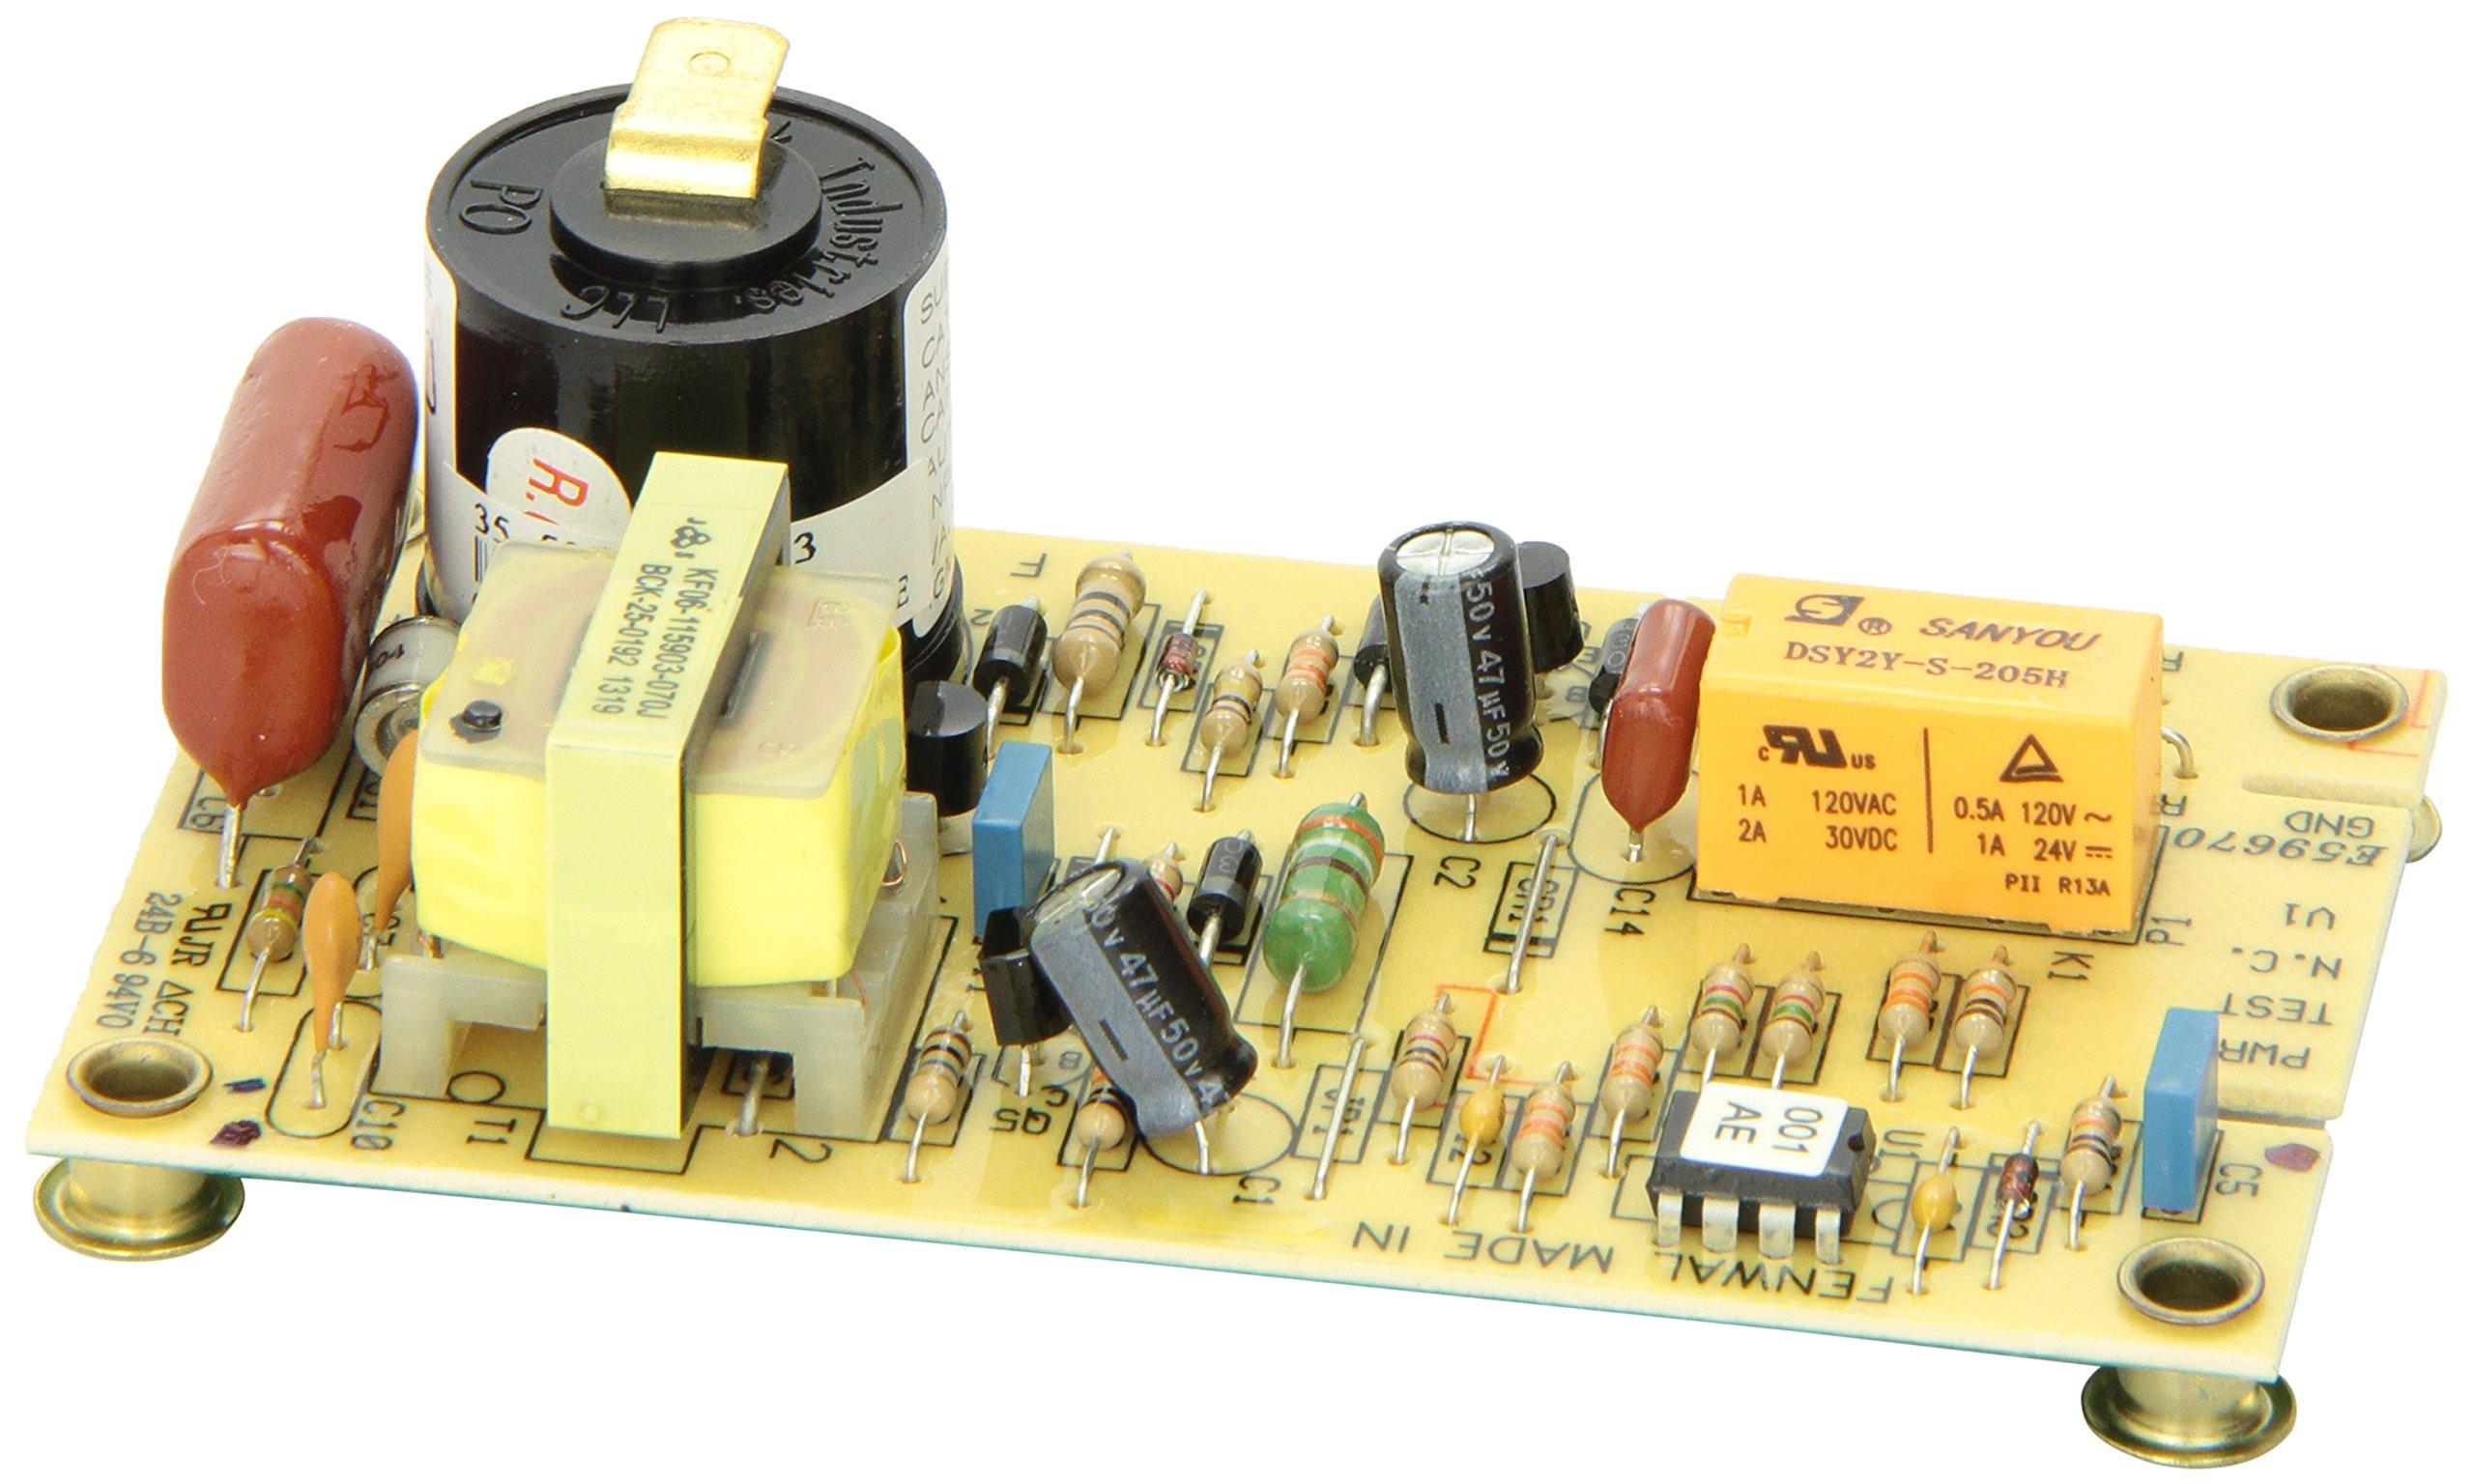 Groovy Wiring Water Heater Sw10De Parts Diagram Wiring Diagram G9 Wiring 101 Cominwise Assnl